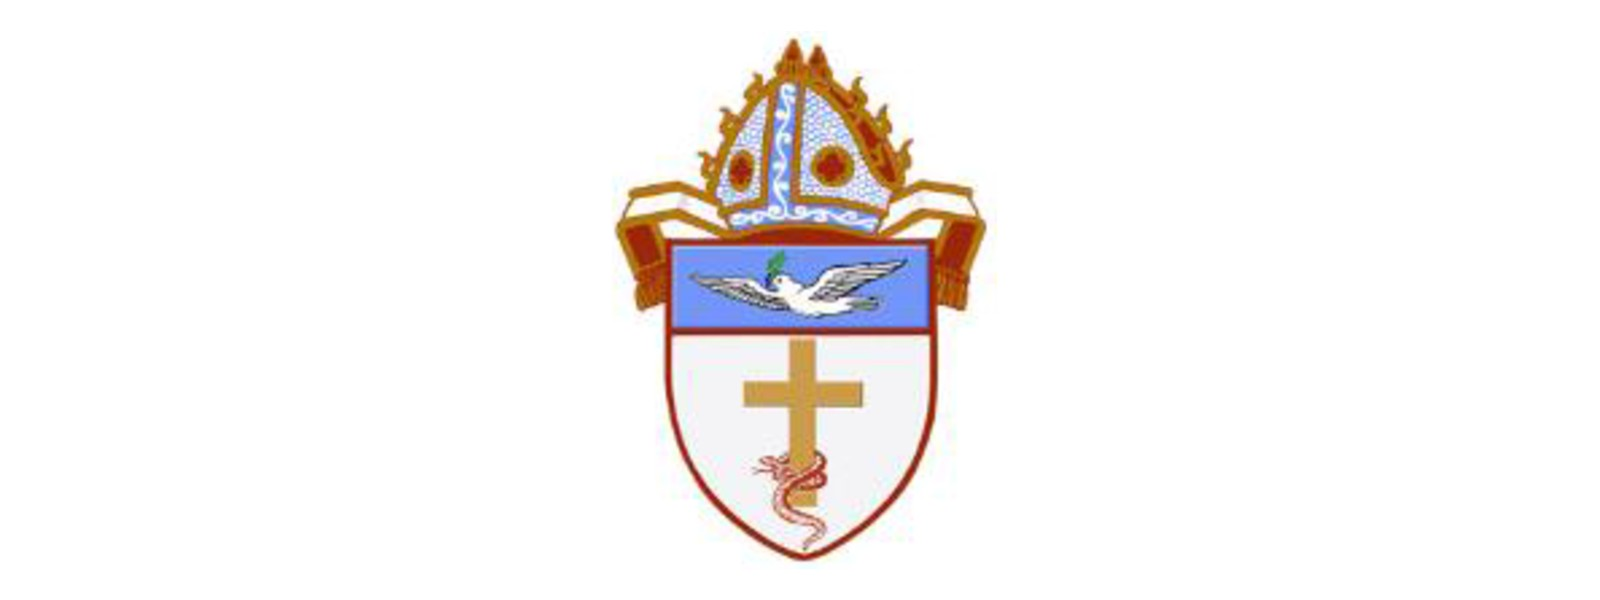 Church of Ceylon raises concerns over human rights in Sri Lanka